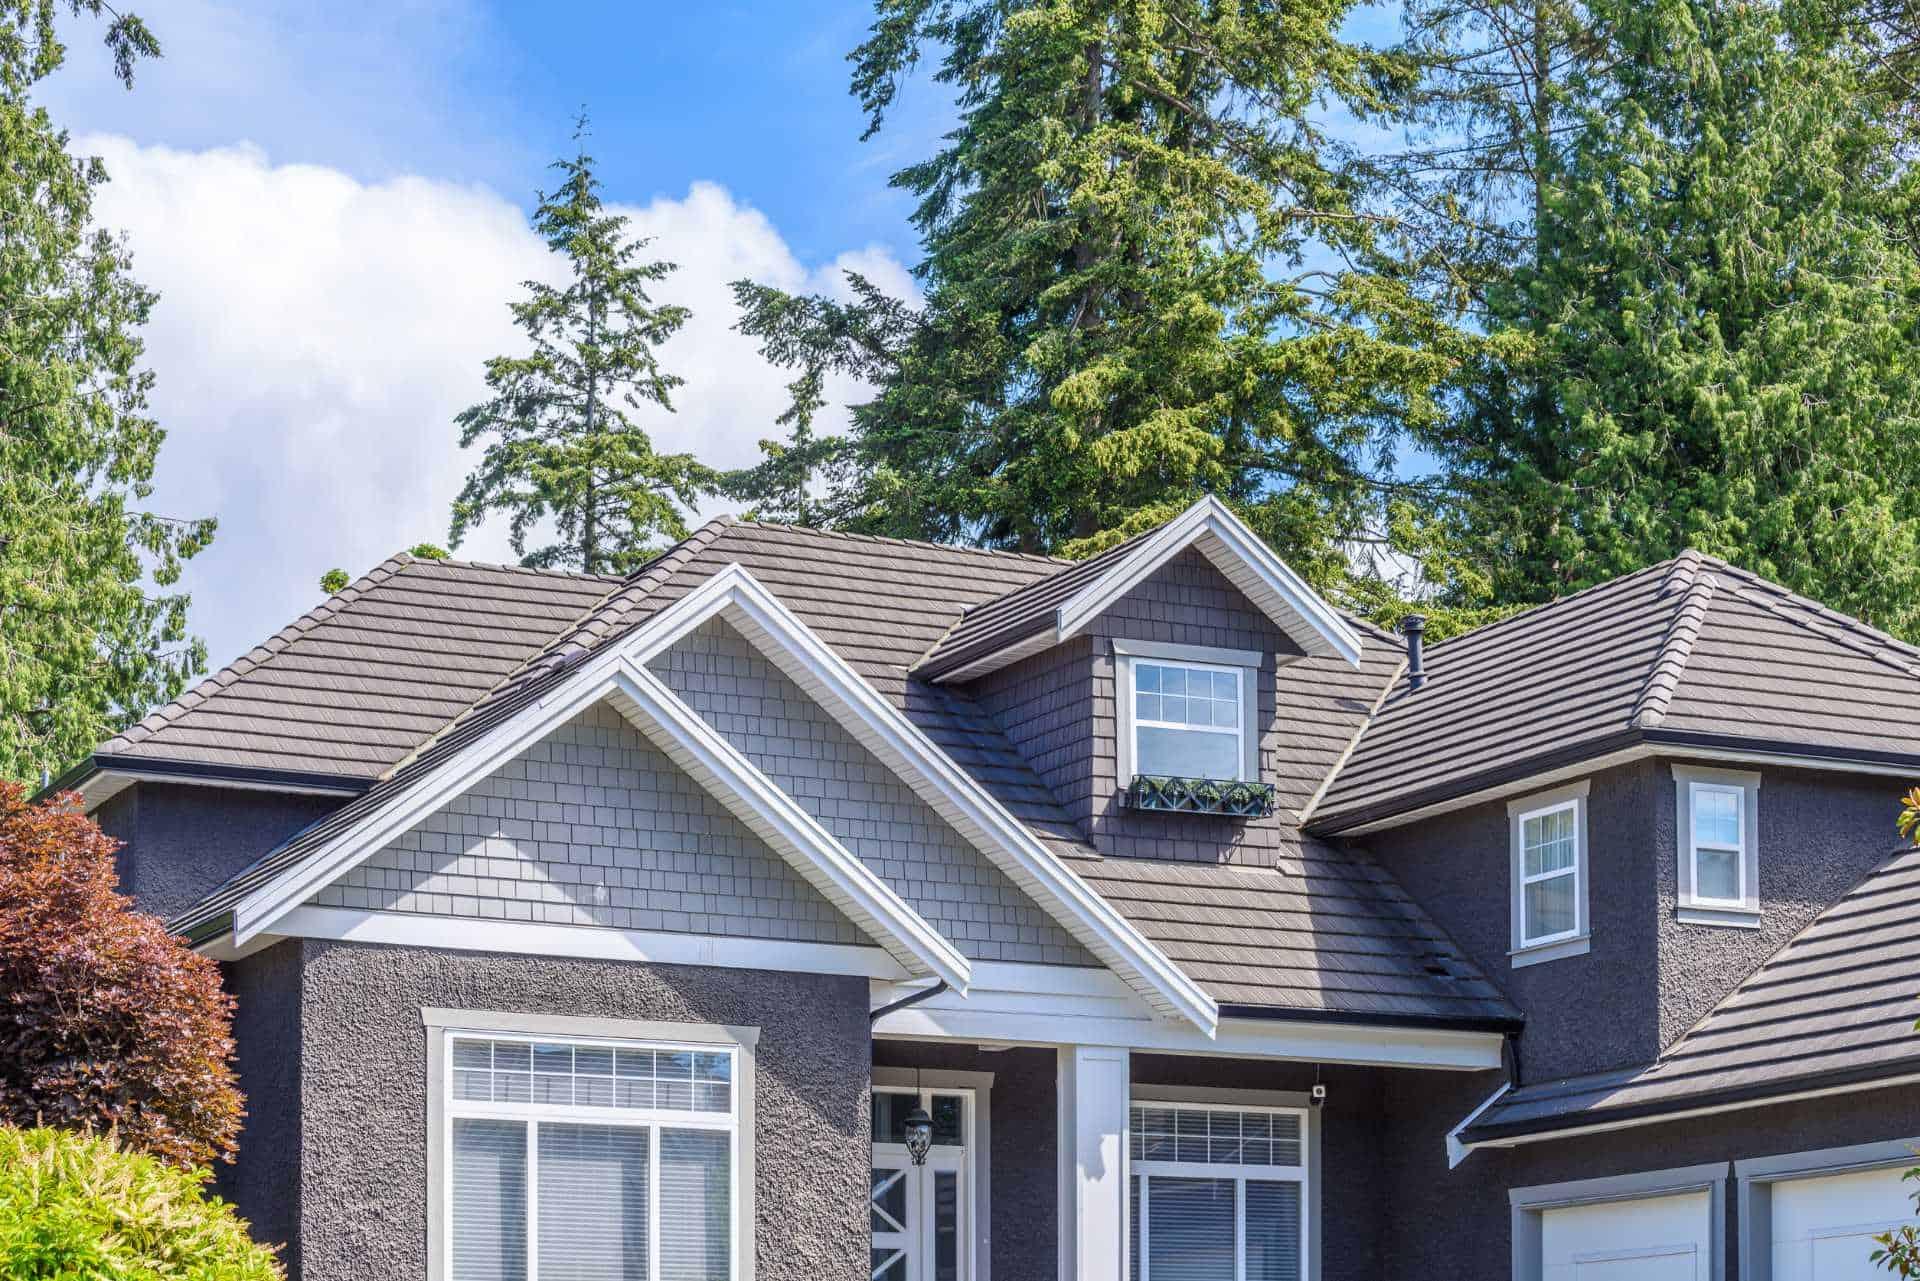 home with gray siding and asphalt shingle roof